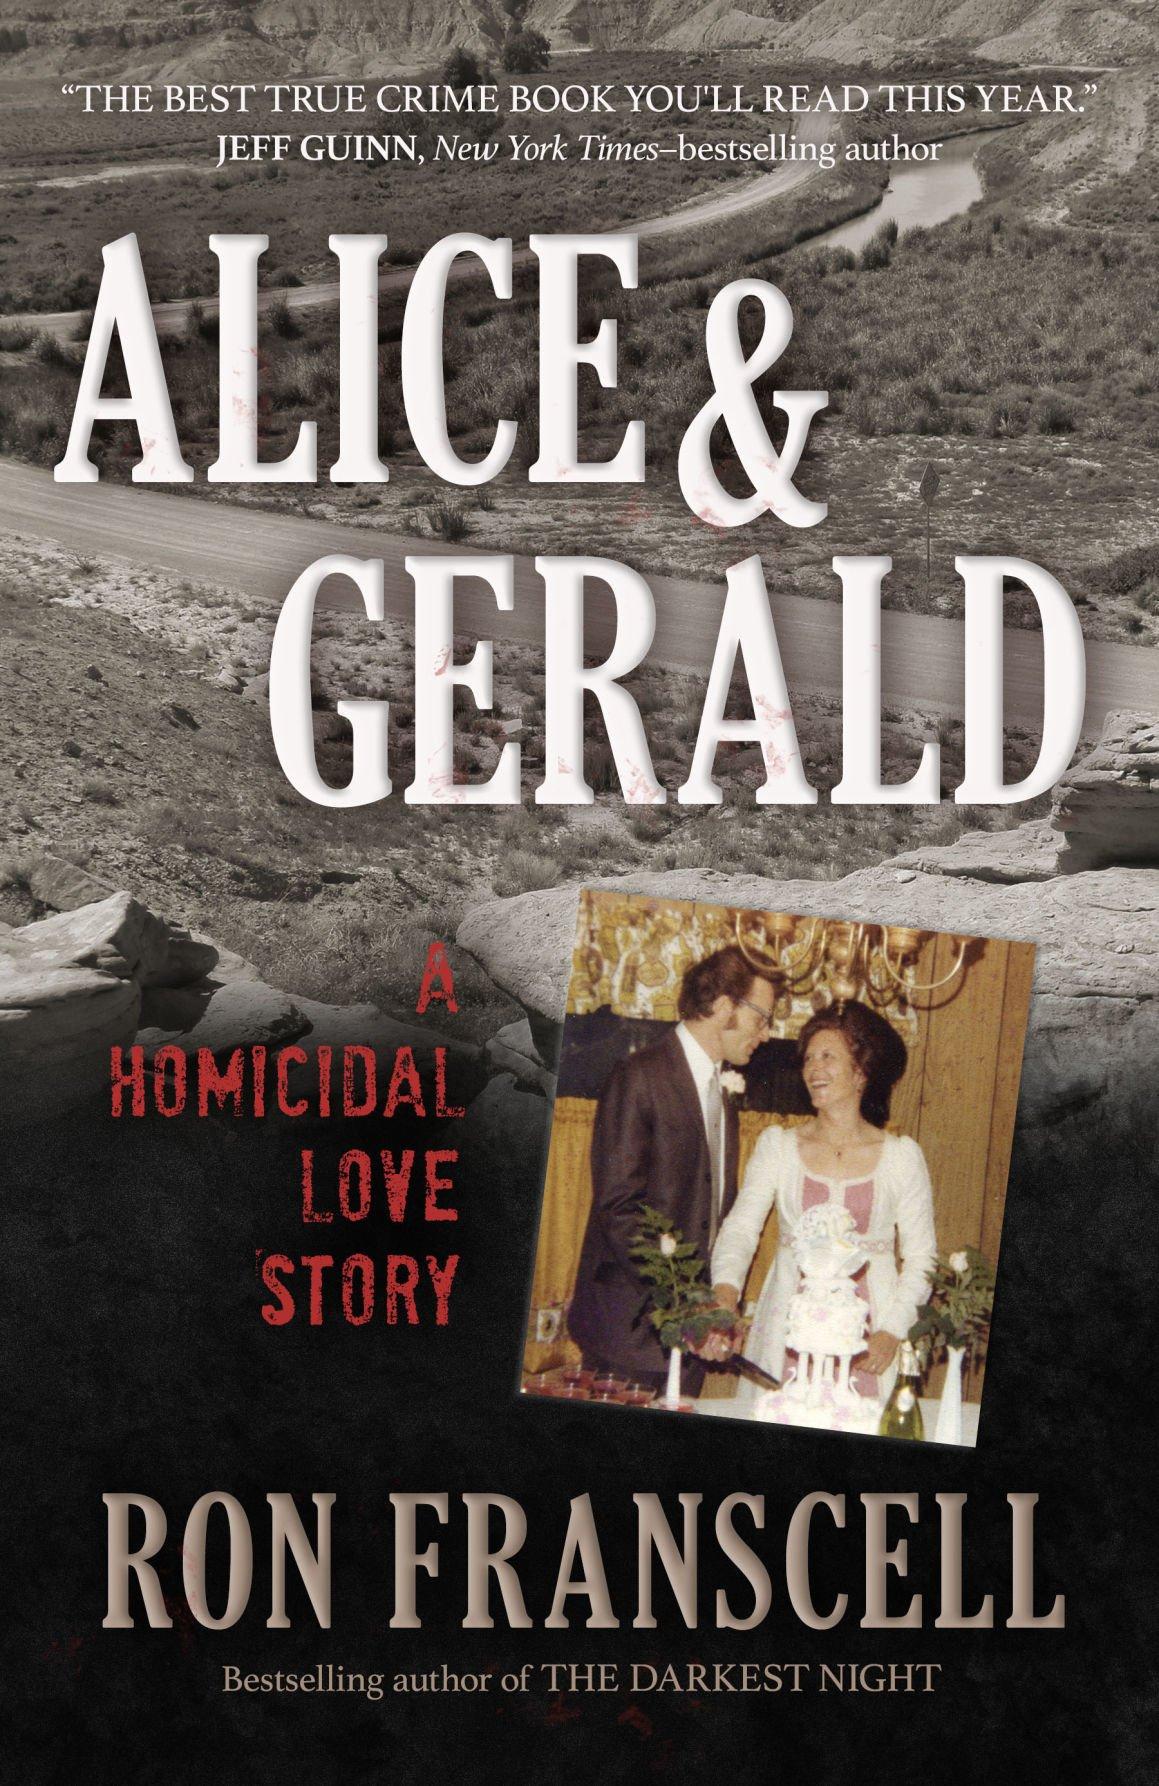 'Alice & Gerald: A Homicidal Love Story'